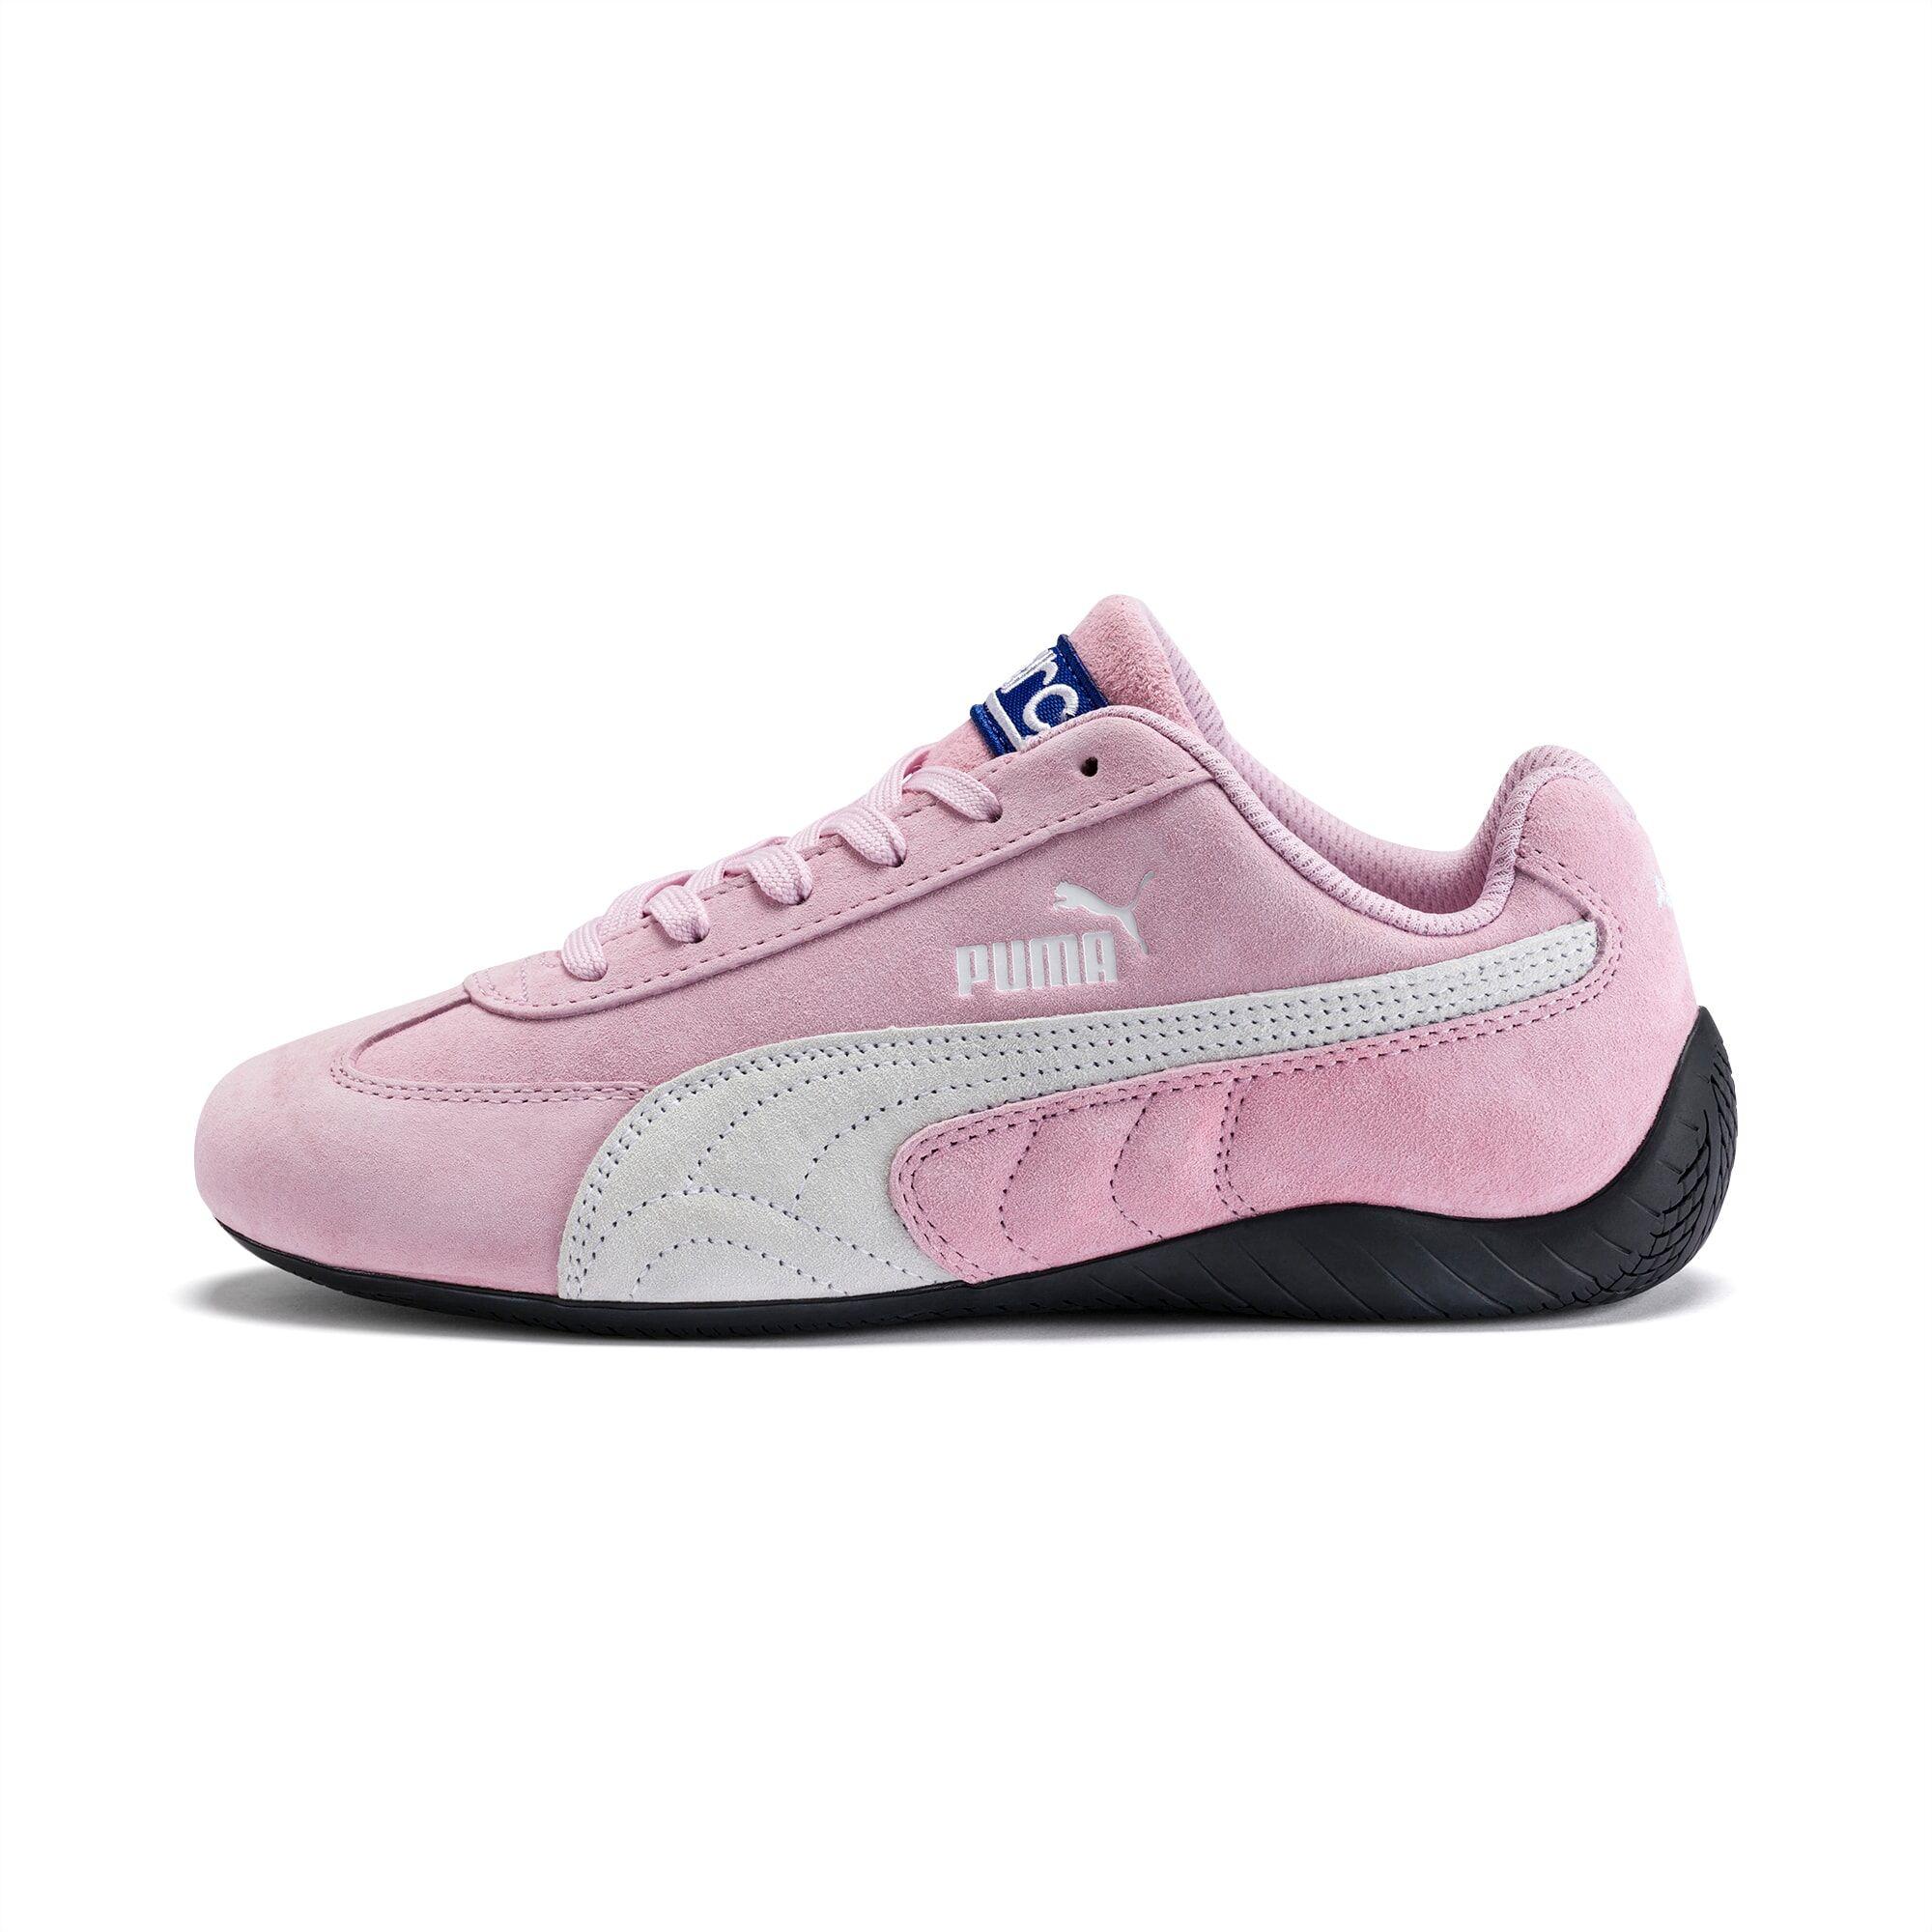 PUMA Chaussure Basket SpeedCat Sparco, Rose/Blanc, Taille 39, Vêtements